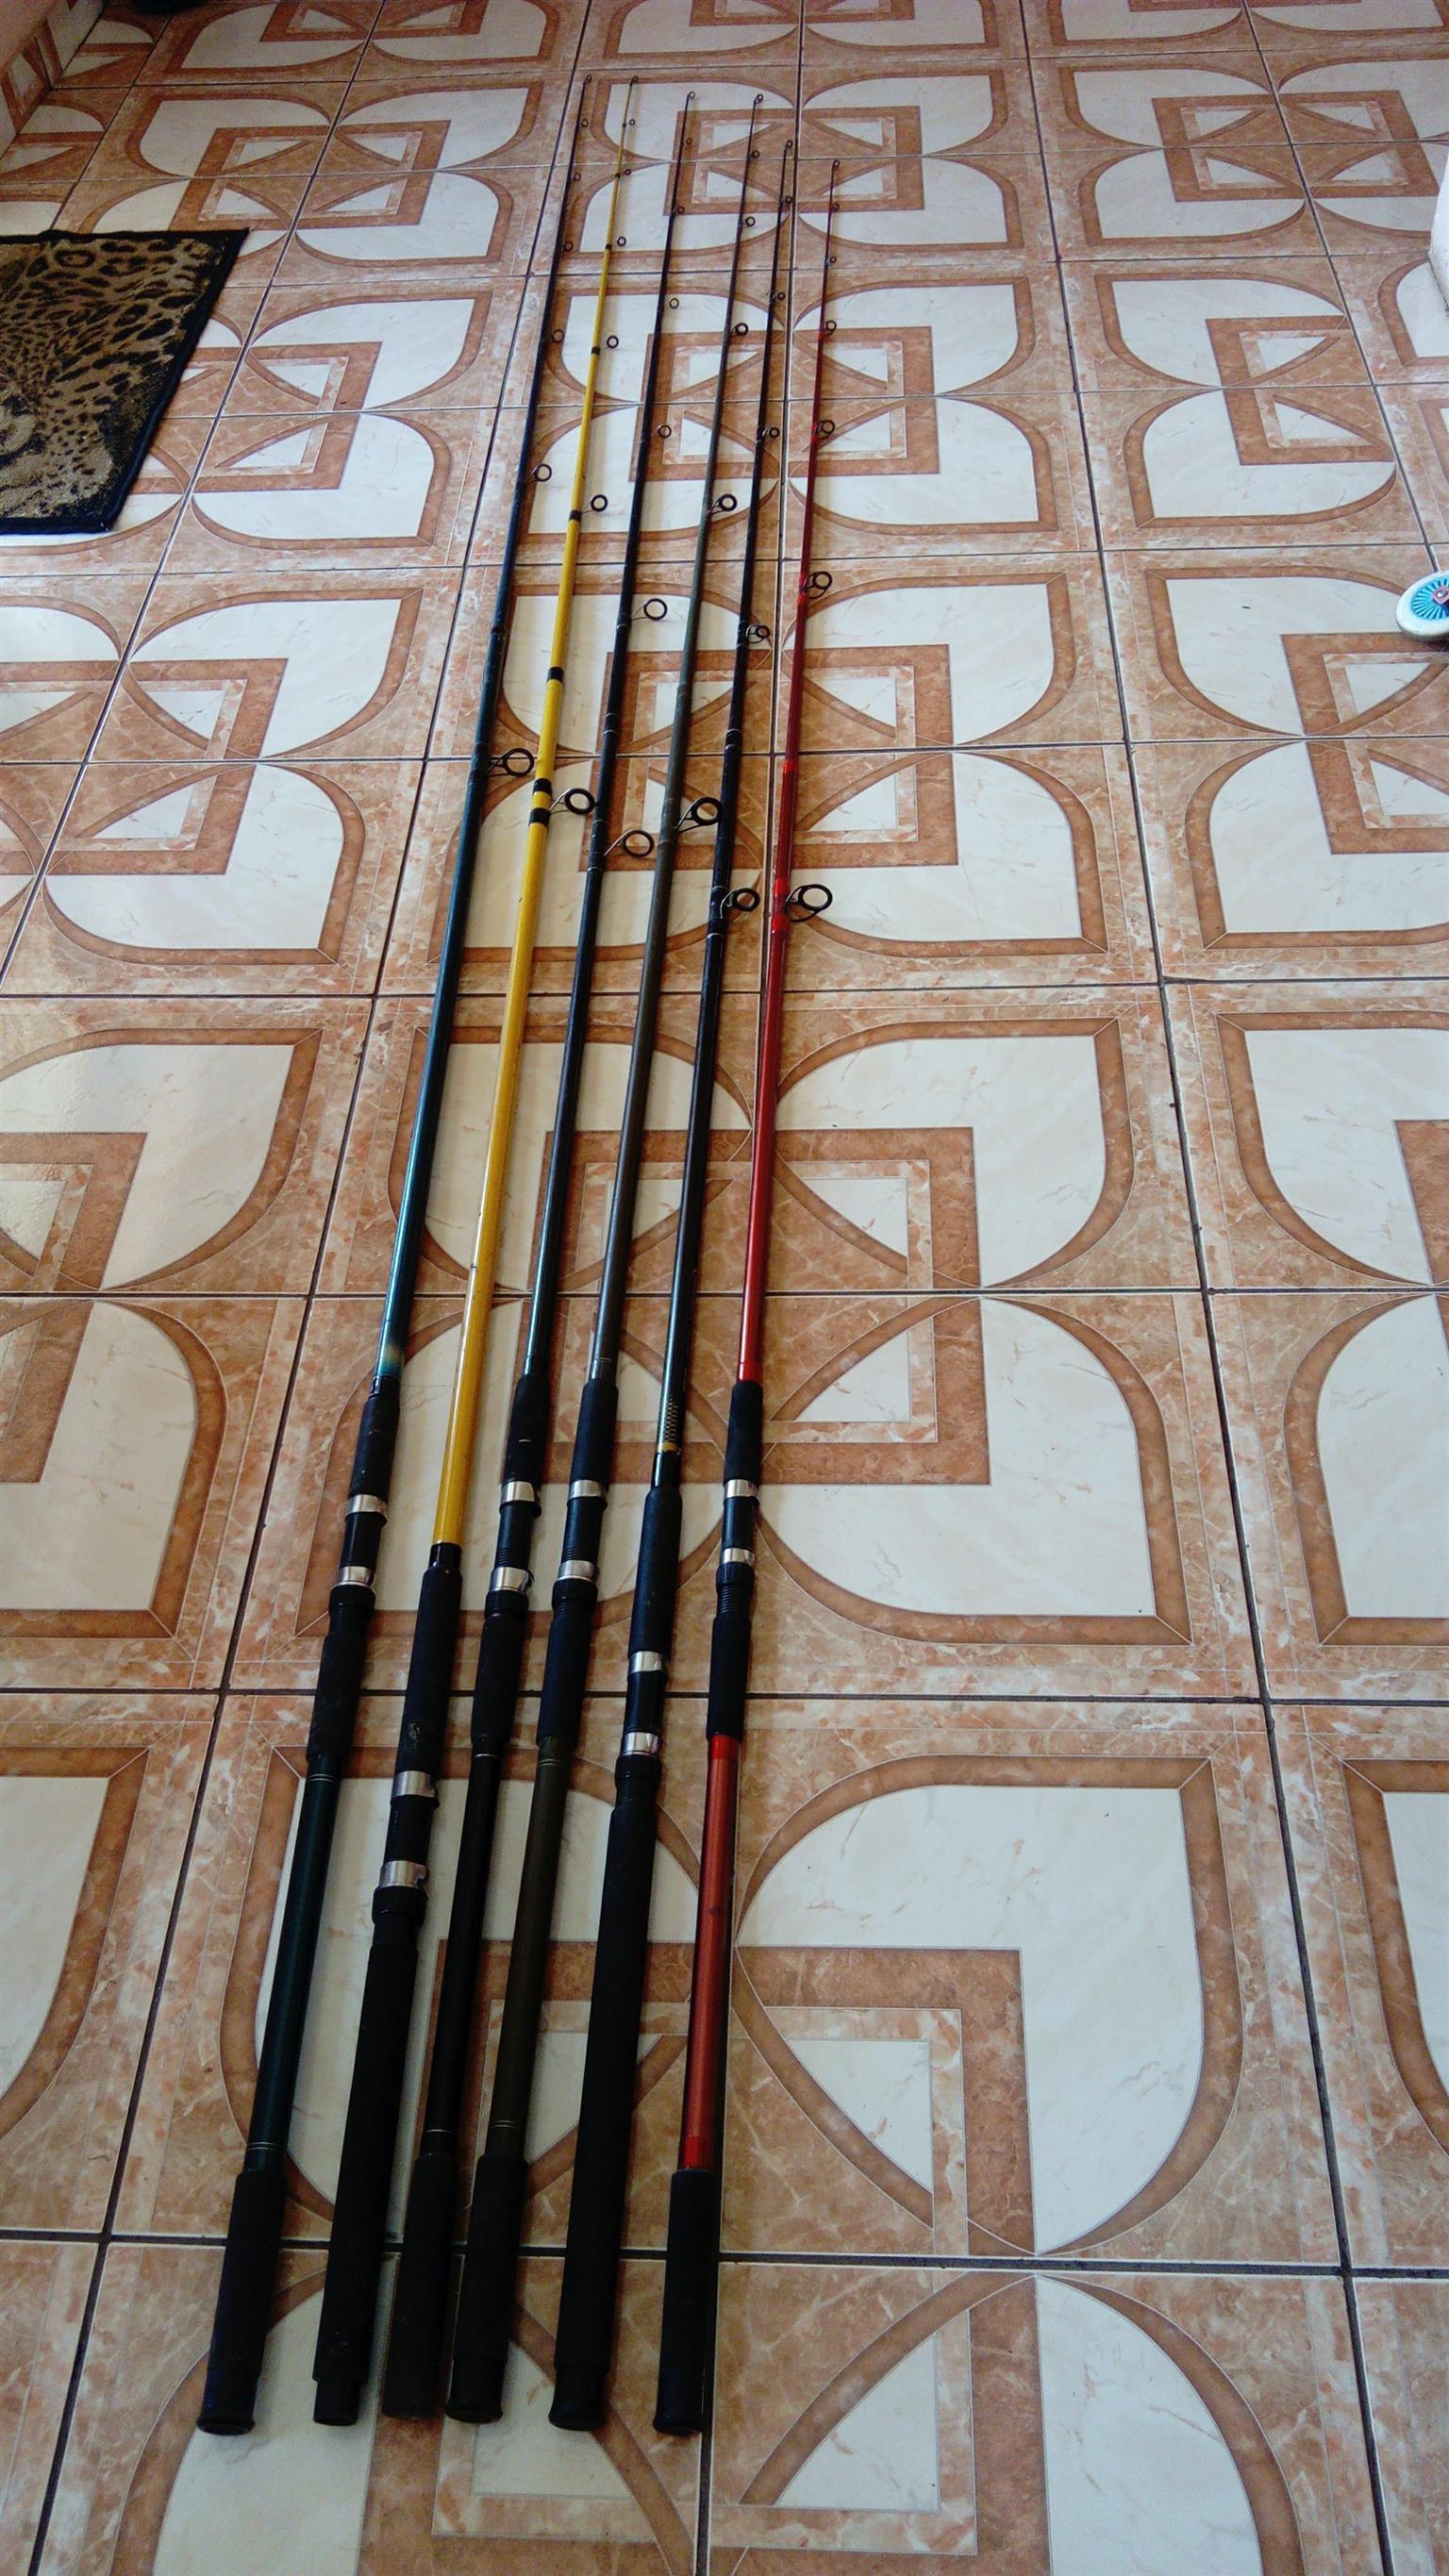 Fishing rod with reel per set view in heuweloord